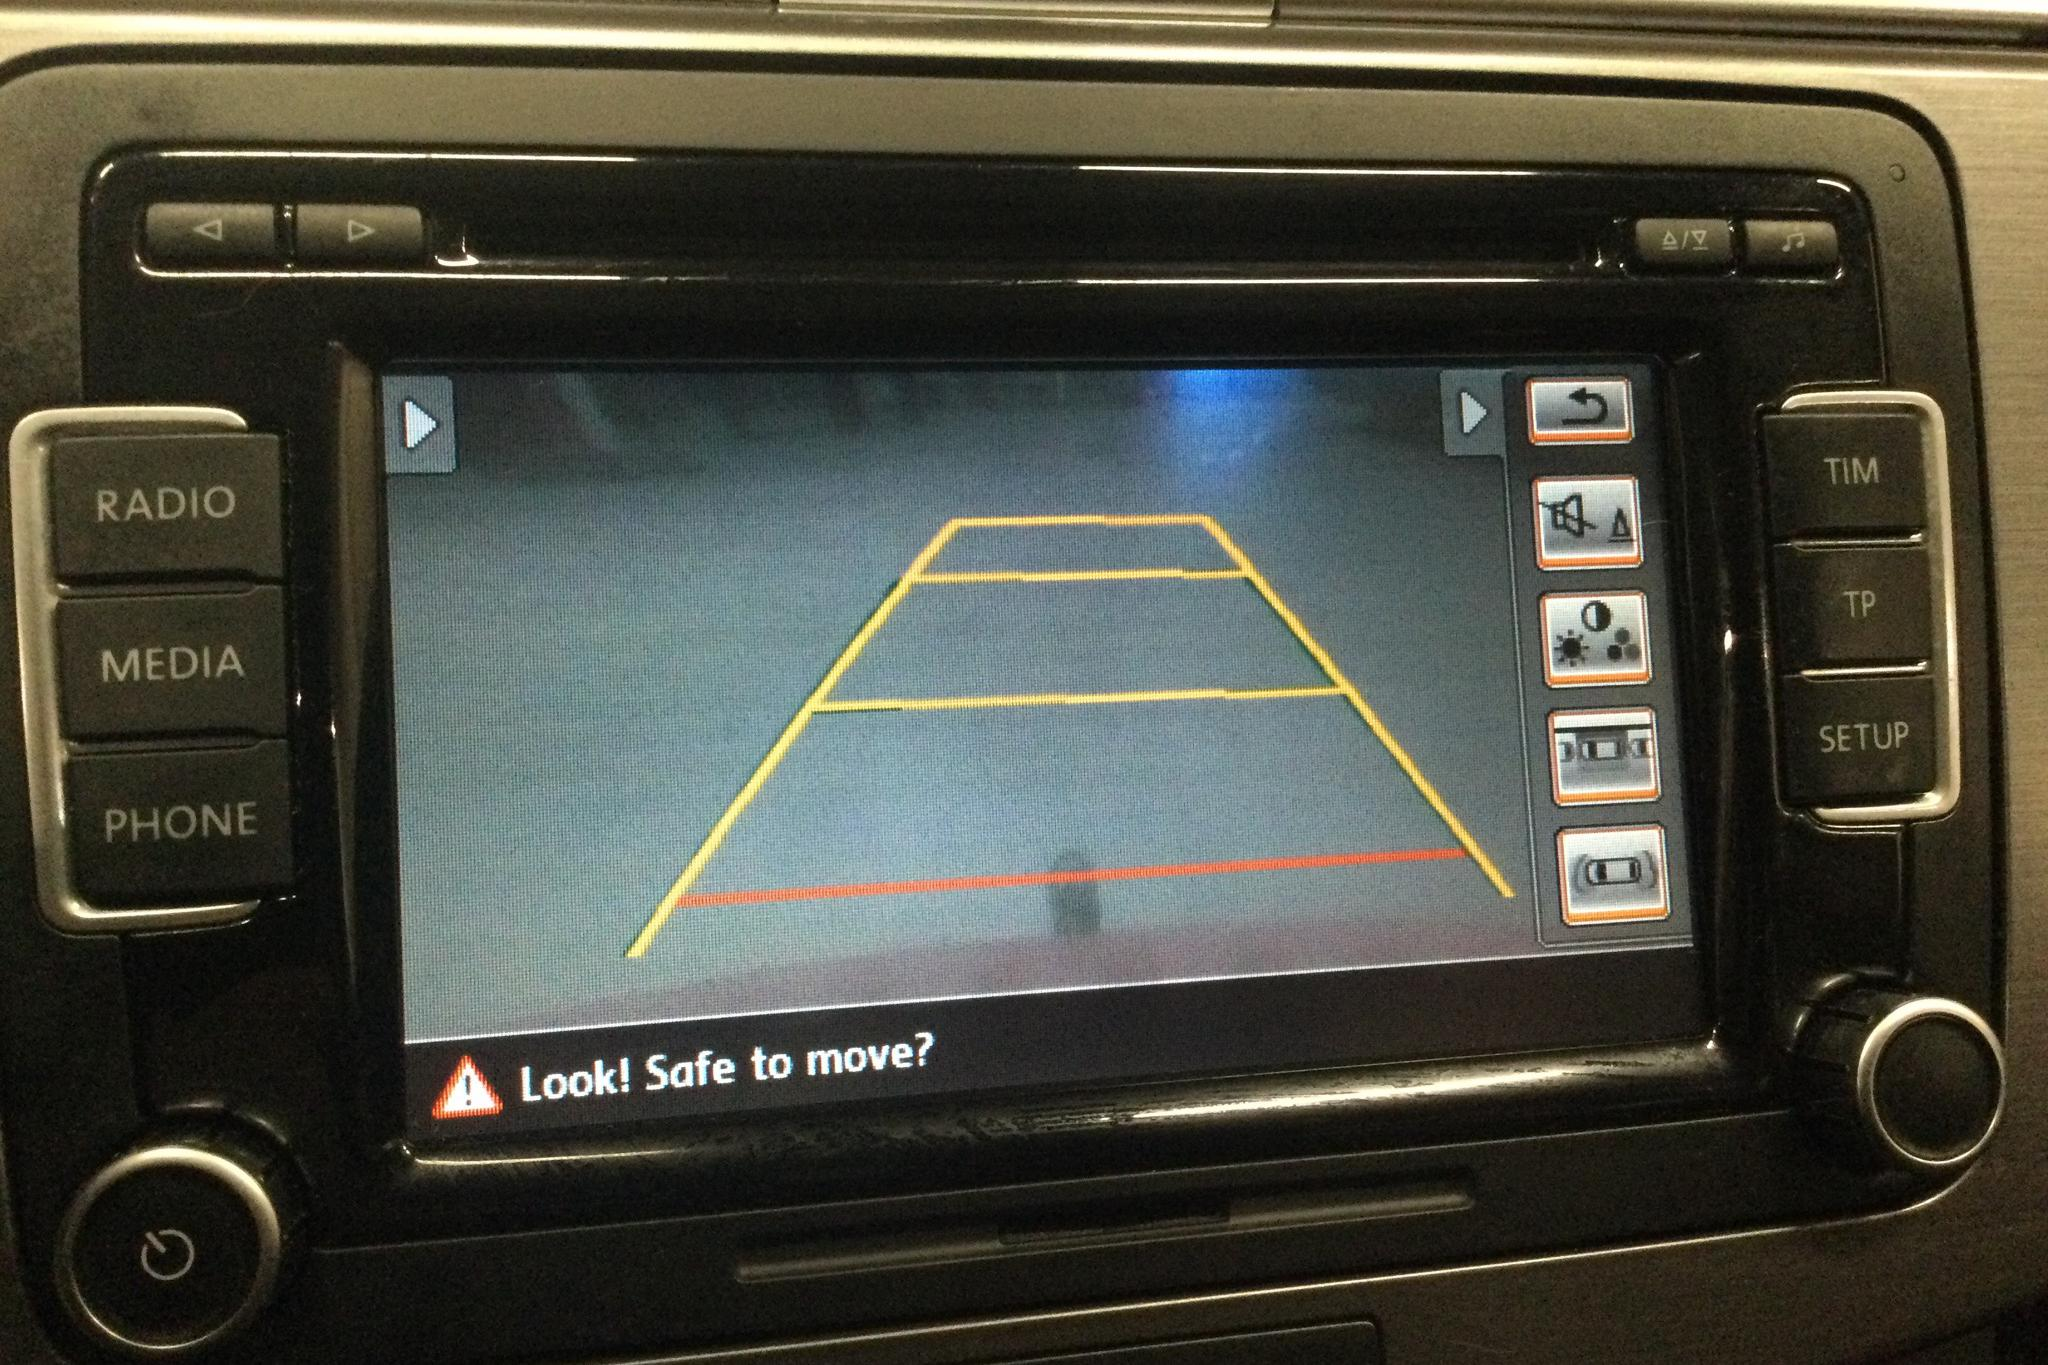 VW Passat 2.0 TDI BlueMotion Technology Variant 4Motion (177hk) - 19 738 mil - Automat - röd - 2014